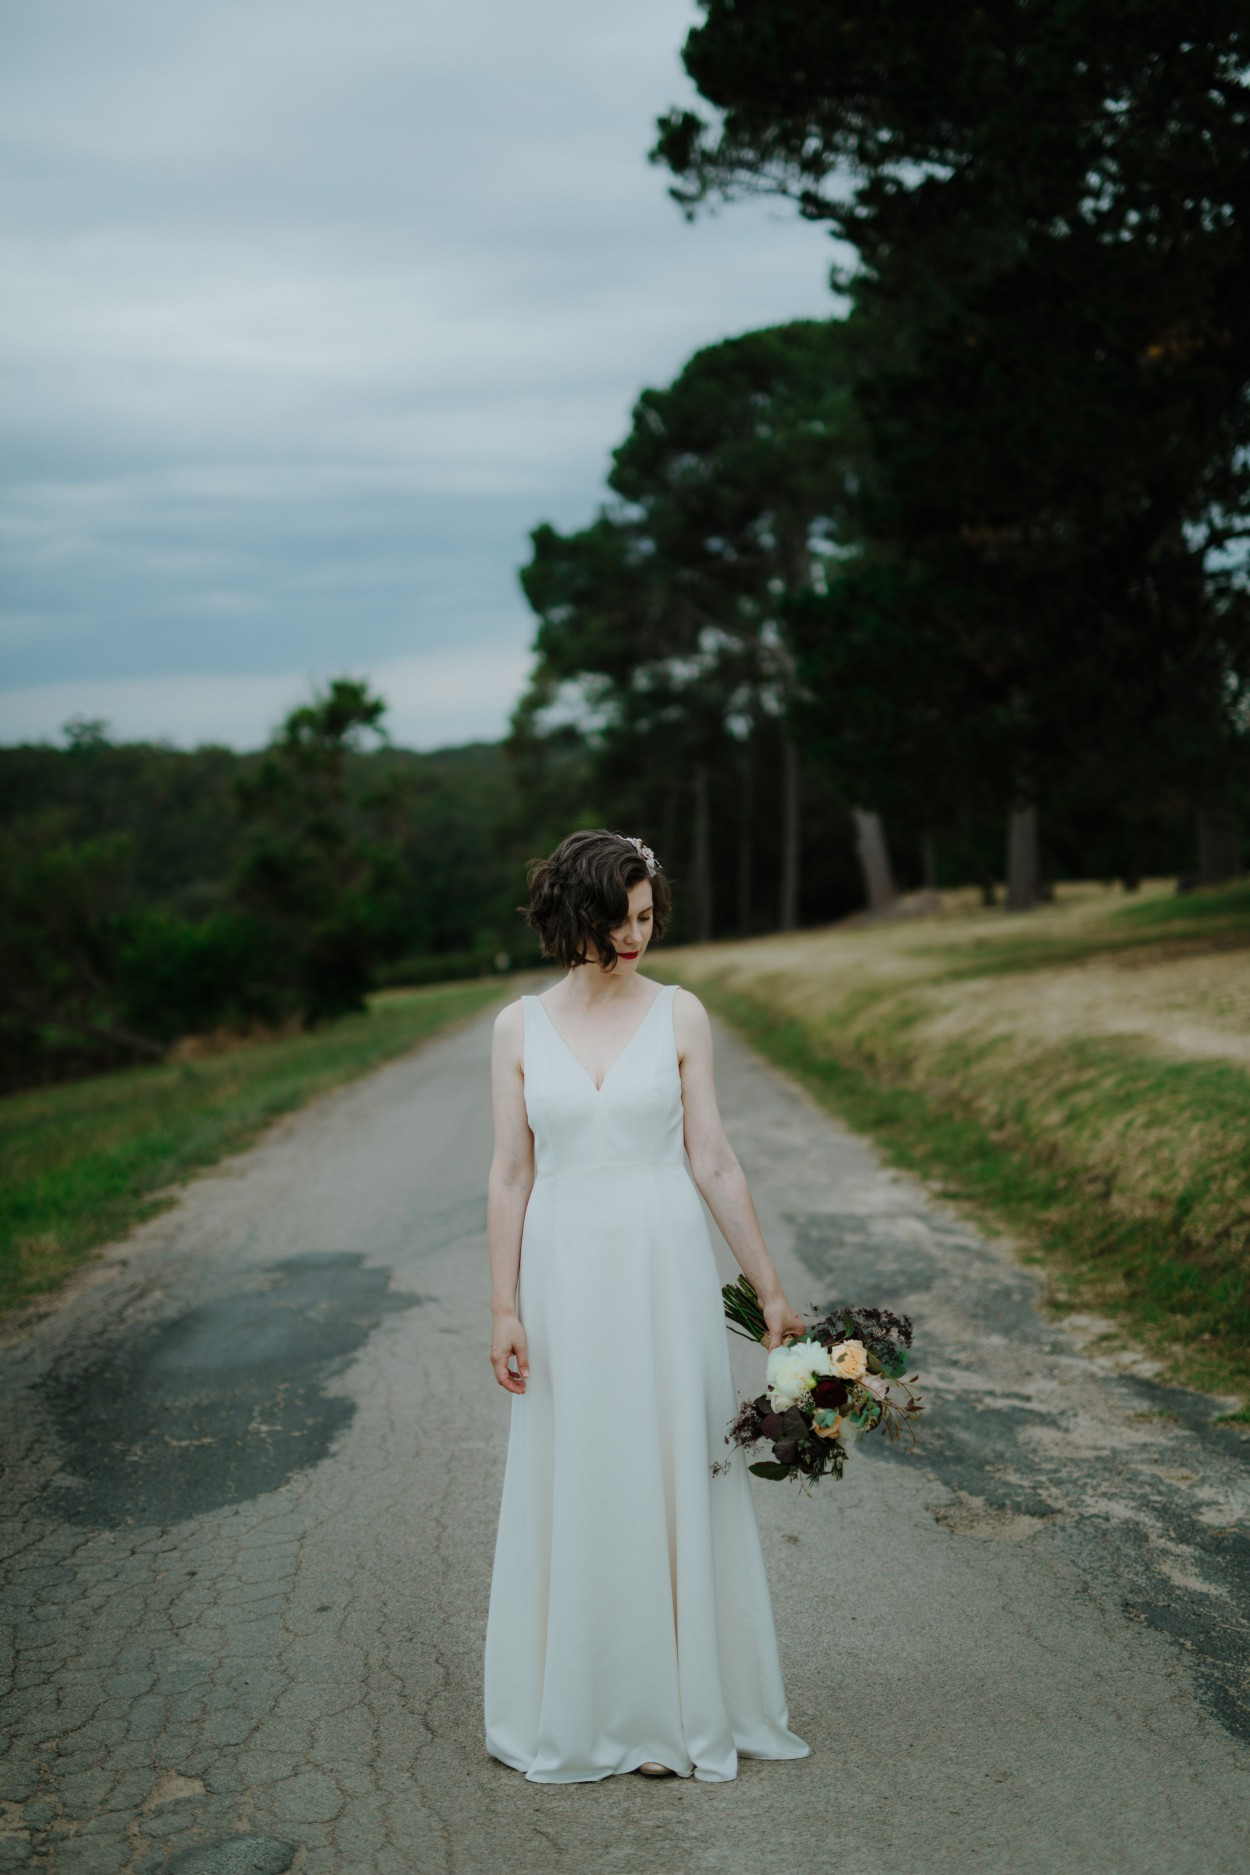 I-Got-You-Babe-&-Co.-Wedding-Photographers-Elsa017.jpg